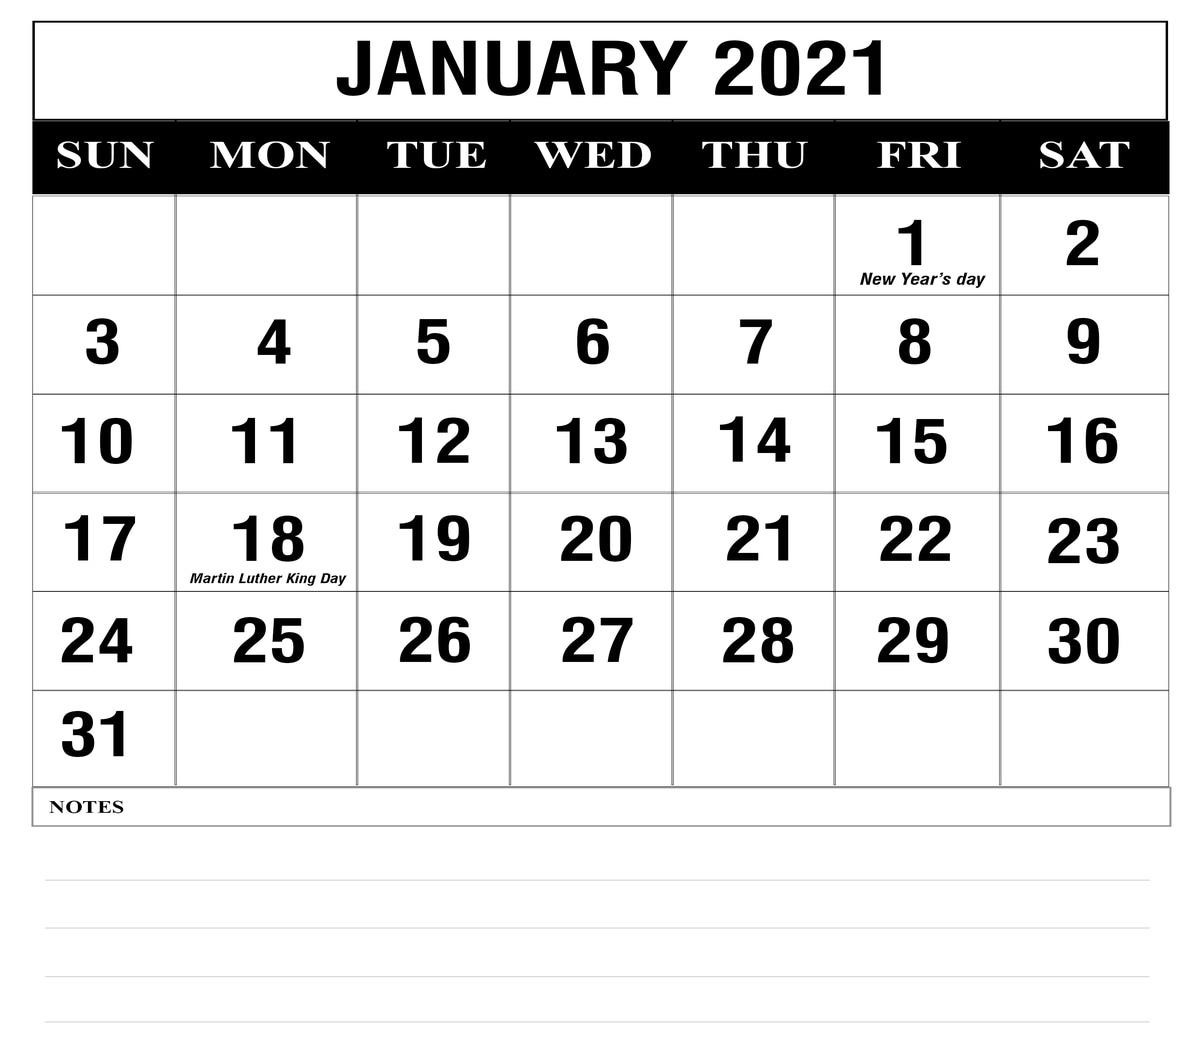 Free January 2021 Printable Calendar Template In Pdf, Excel, Word | Printable January Calendar